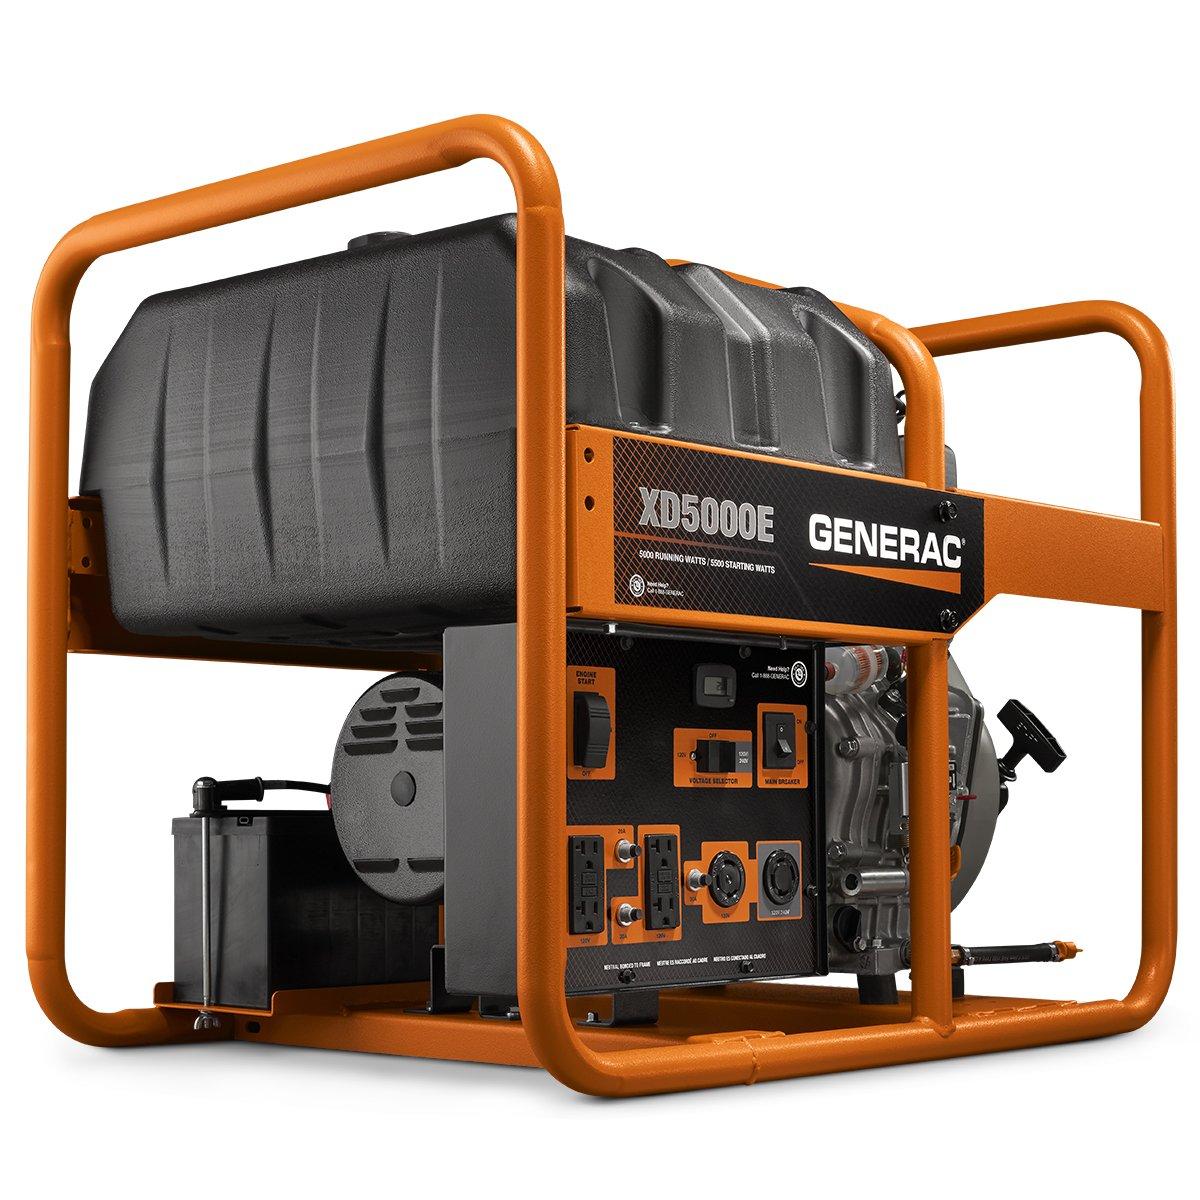 portable diesel generators - generac xd5000e